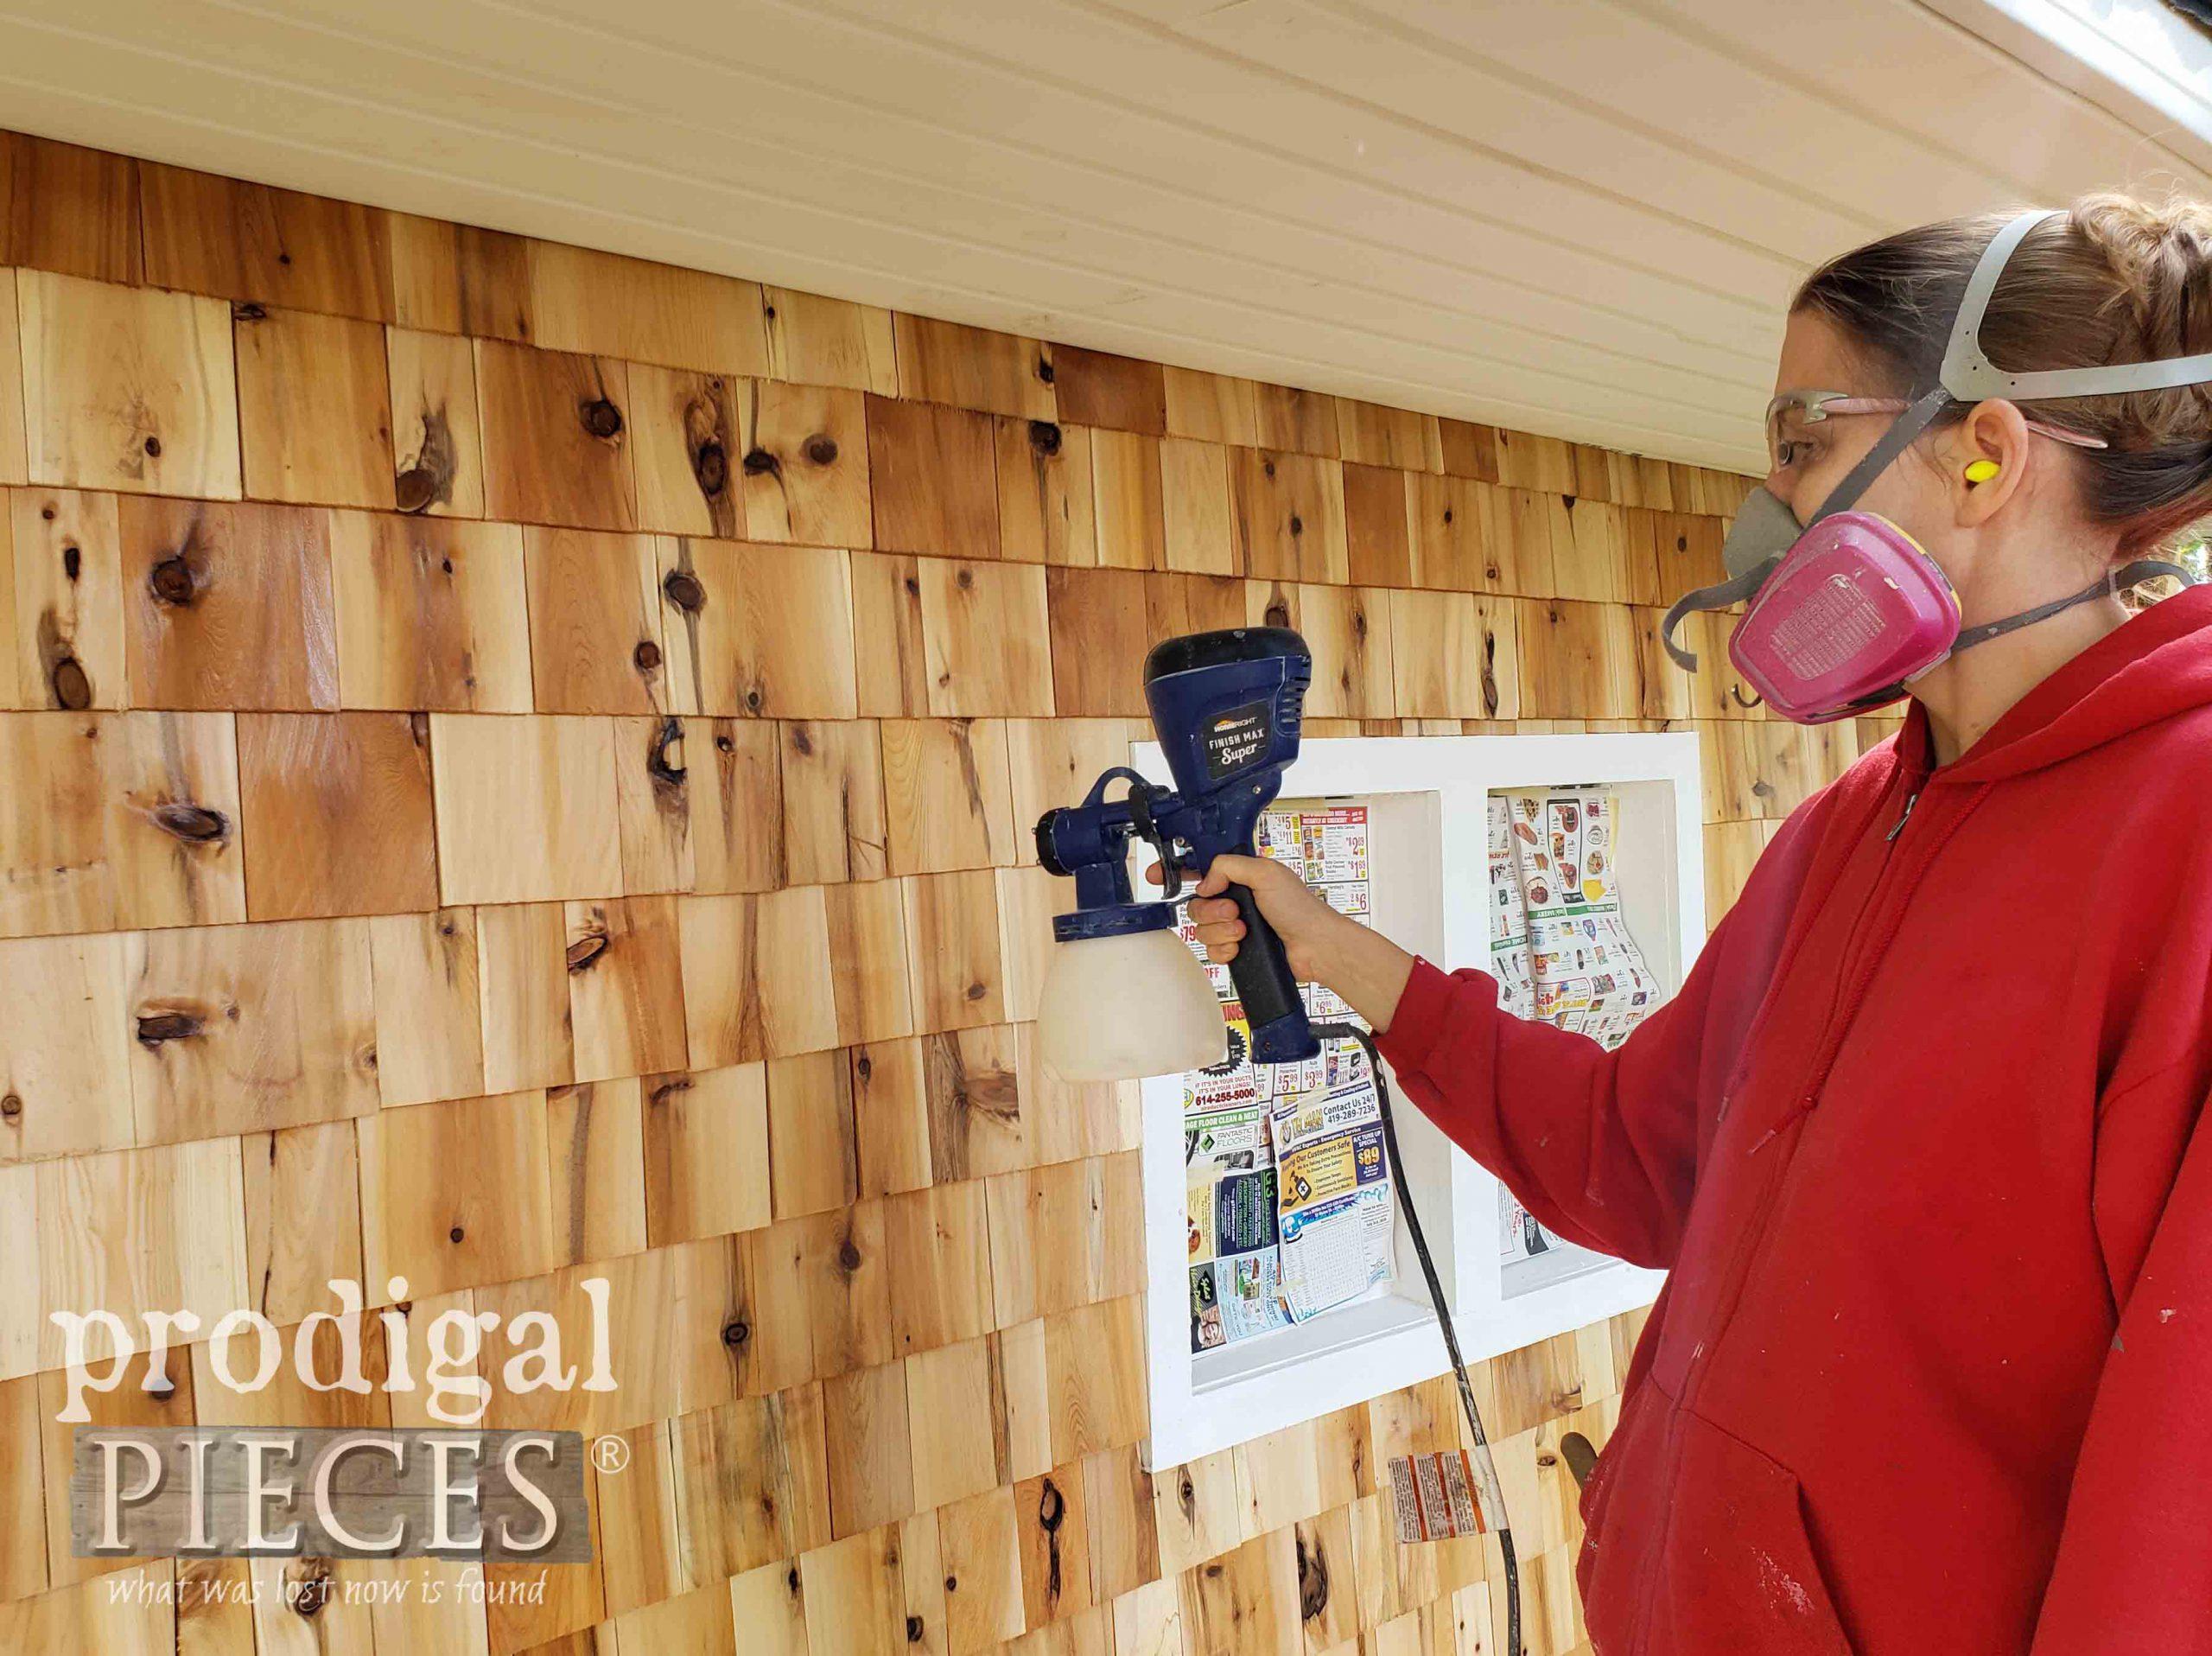 Spraying Cedar Shake Siding with Topcoat | prodigalpieces.com #prodigalpieces